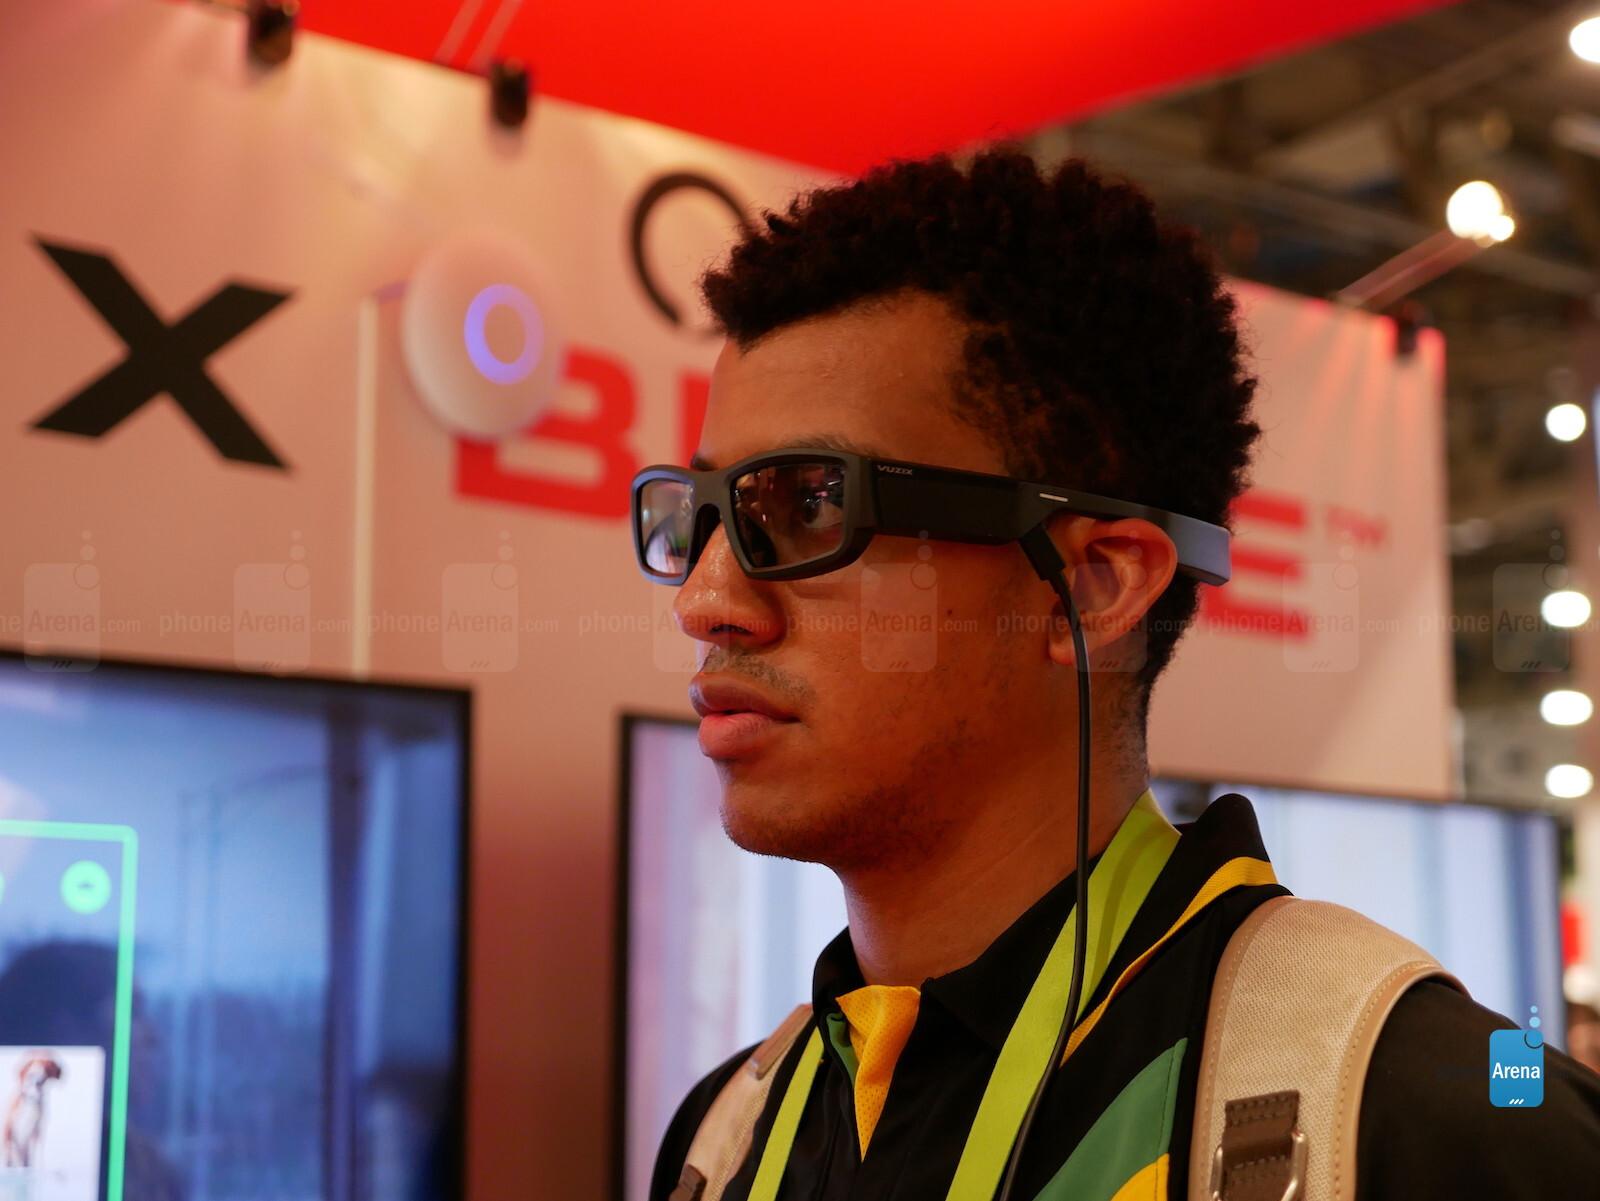 Vuzix Launches Alexa-Enabled Digital Glasses